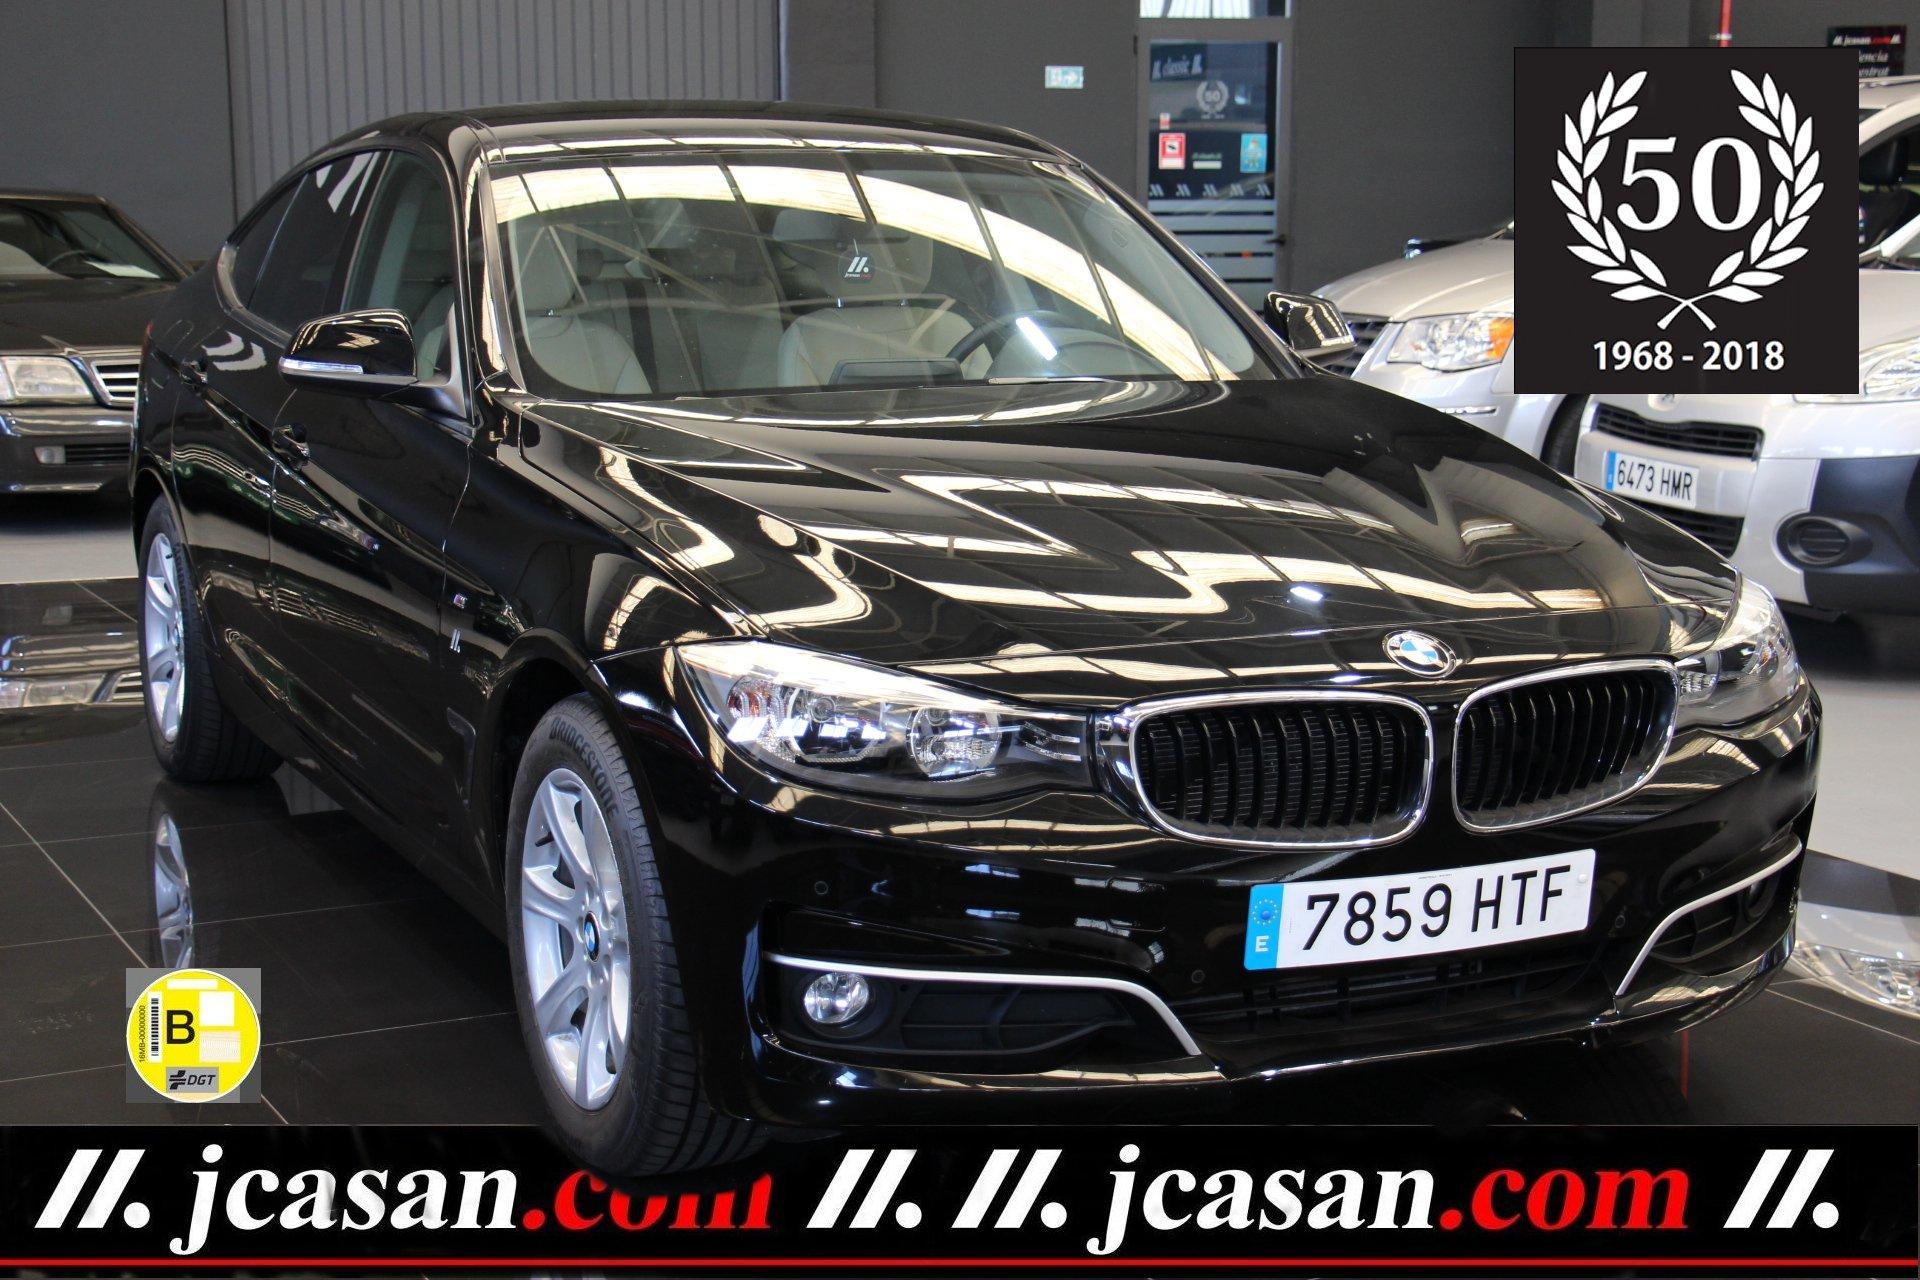 BMW 318d 143 CV GRAN TURISMO 6 Vel